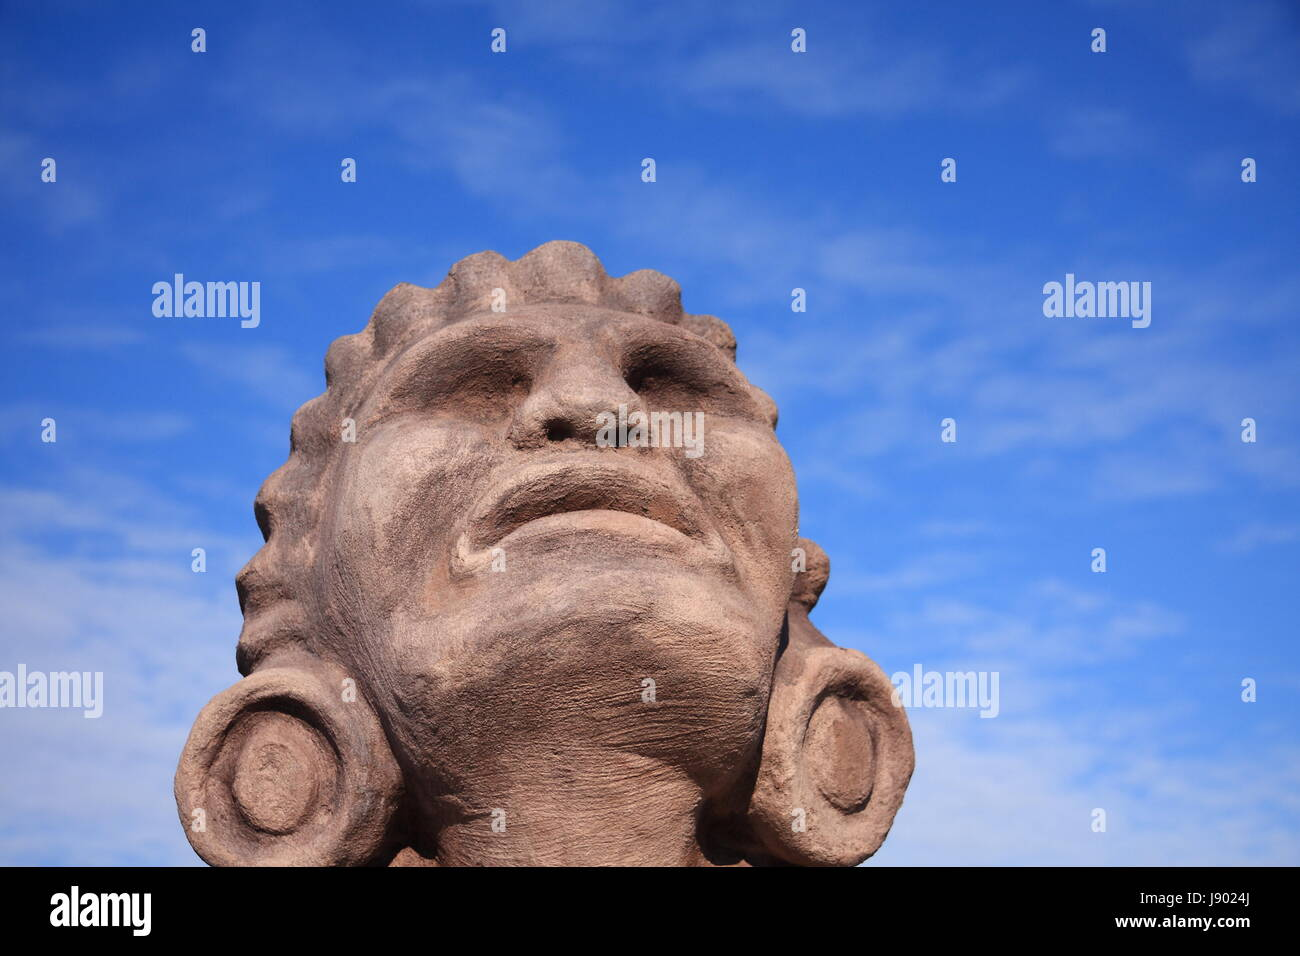 blue, god, portrait, design, shaping, formation, shape, model, figure, aztec, - Stock Image